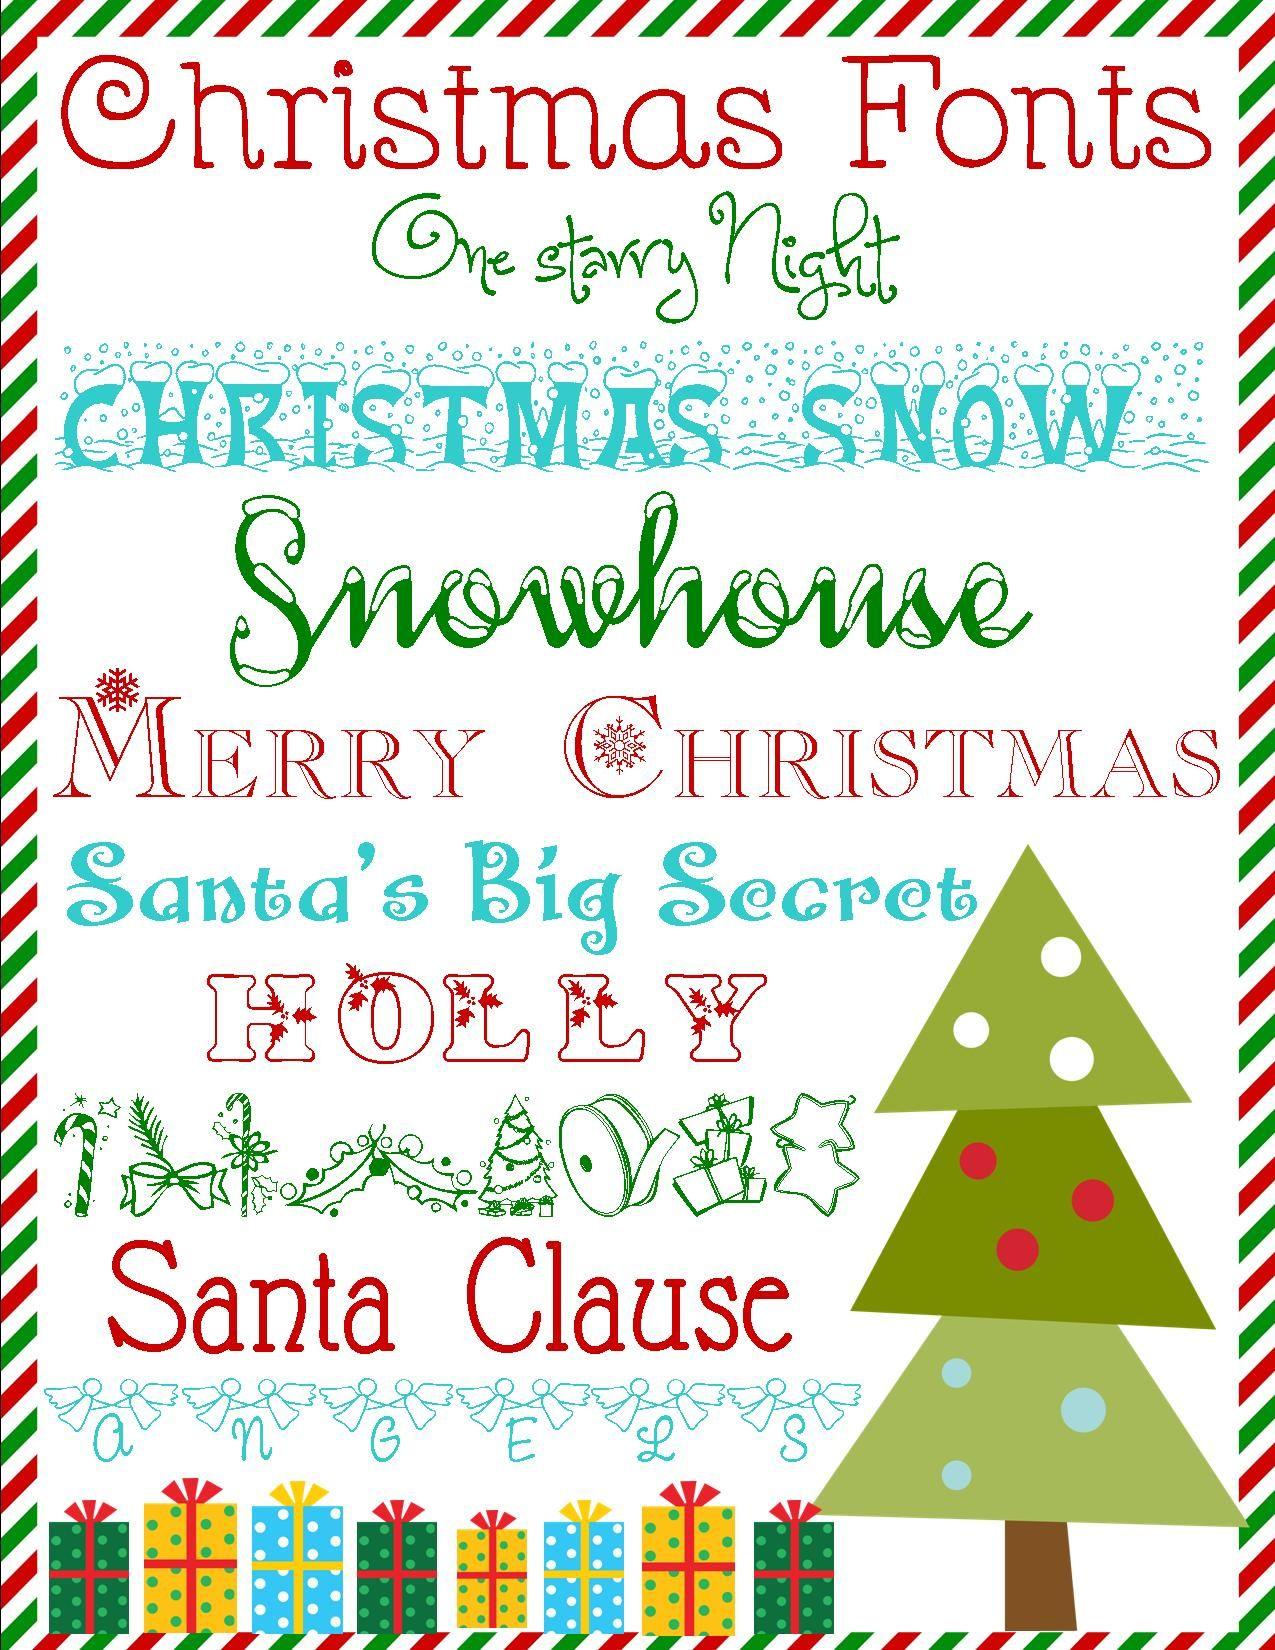 Free Christmas Fonts Christmas Fonts Free Christmas Fonts Free Christmas